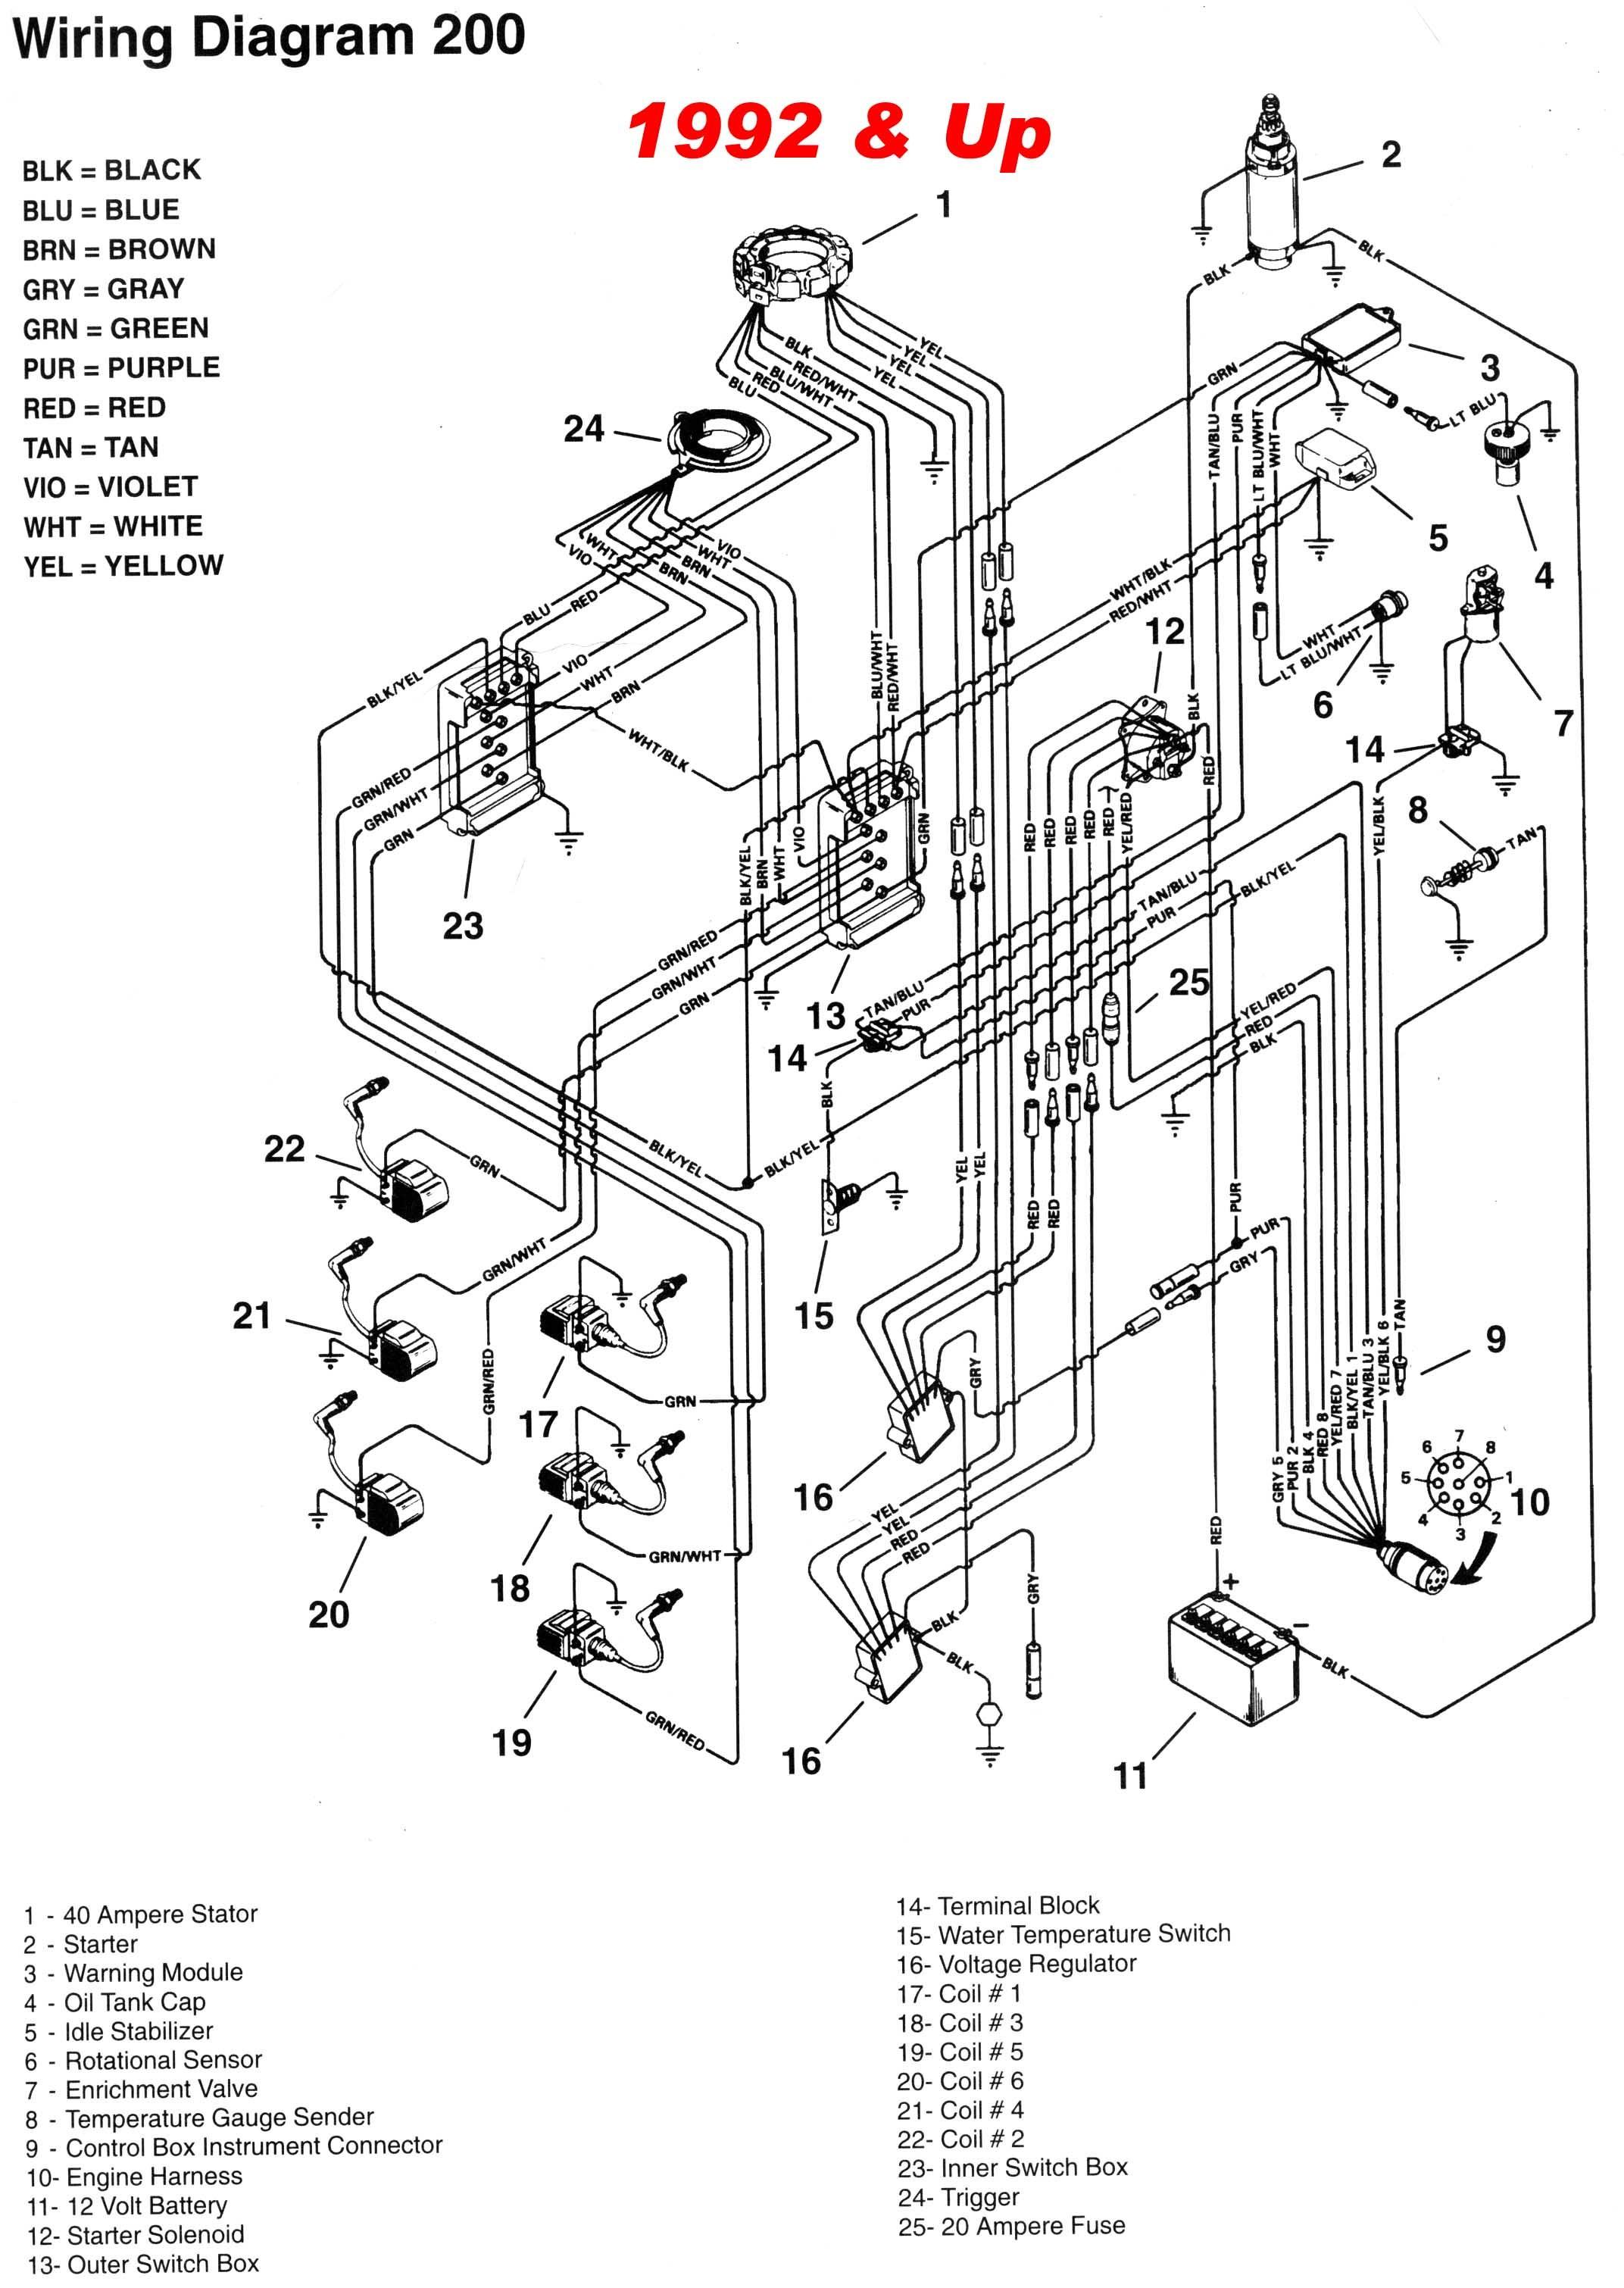 Mercury 4 Stroke Key Switch Wiring 9d Wiring Diagram Mercury 9 9 4 Stroke Of Mercury 4 Stroke Key Switch Wiring